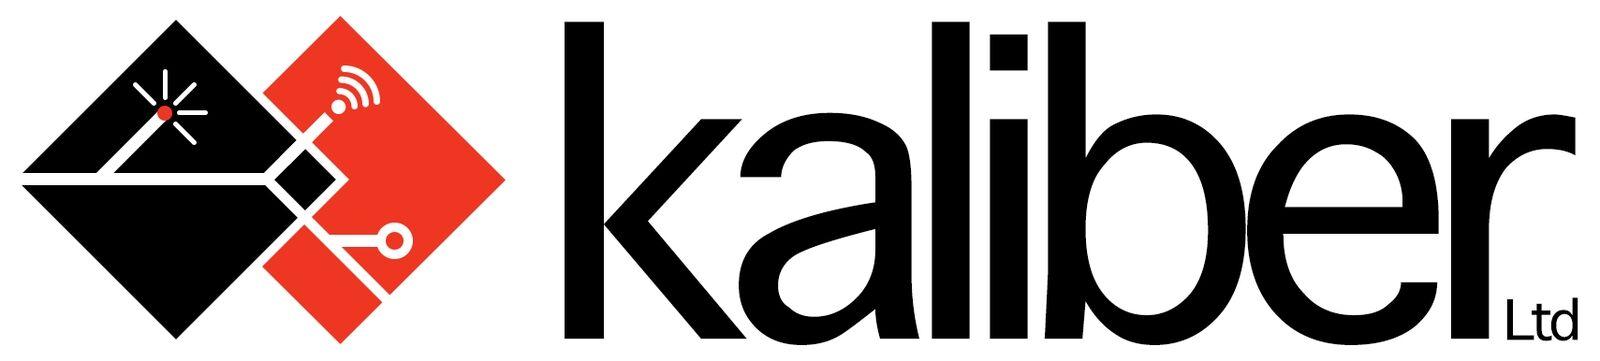 kaliber-ltd